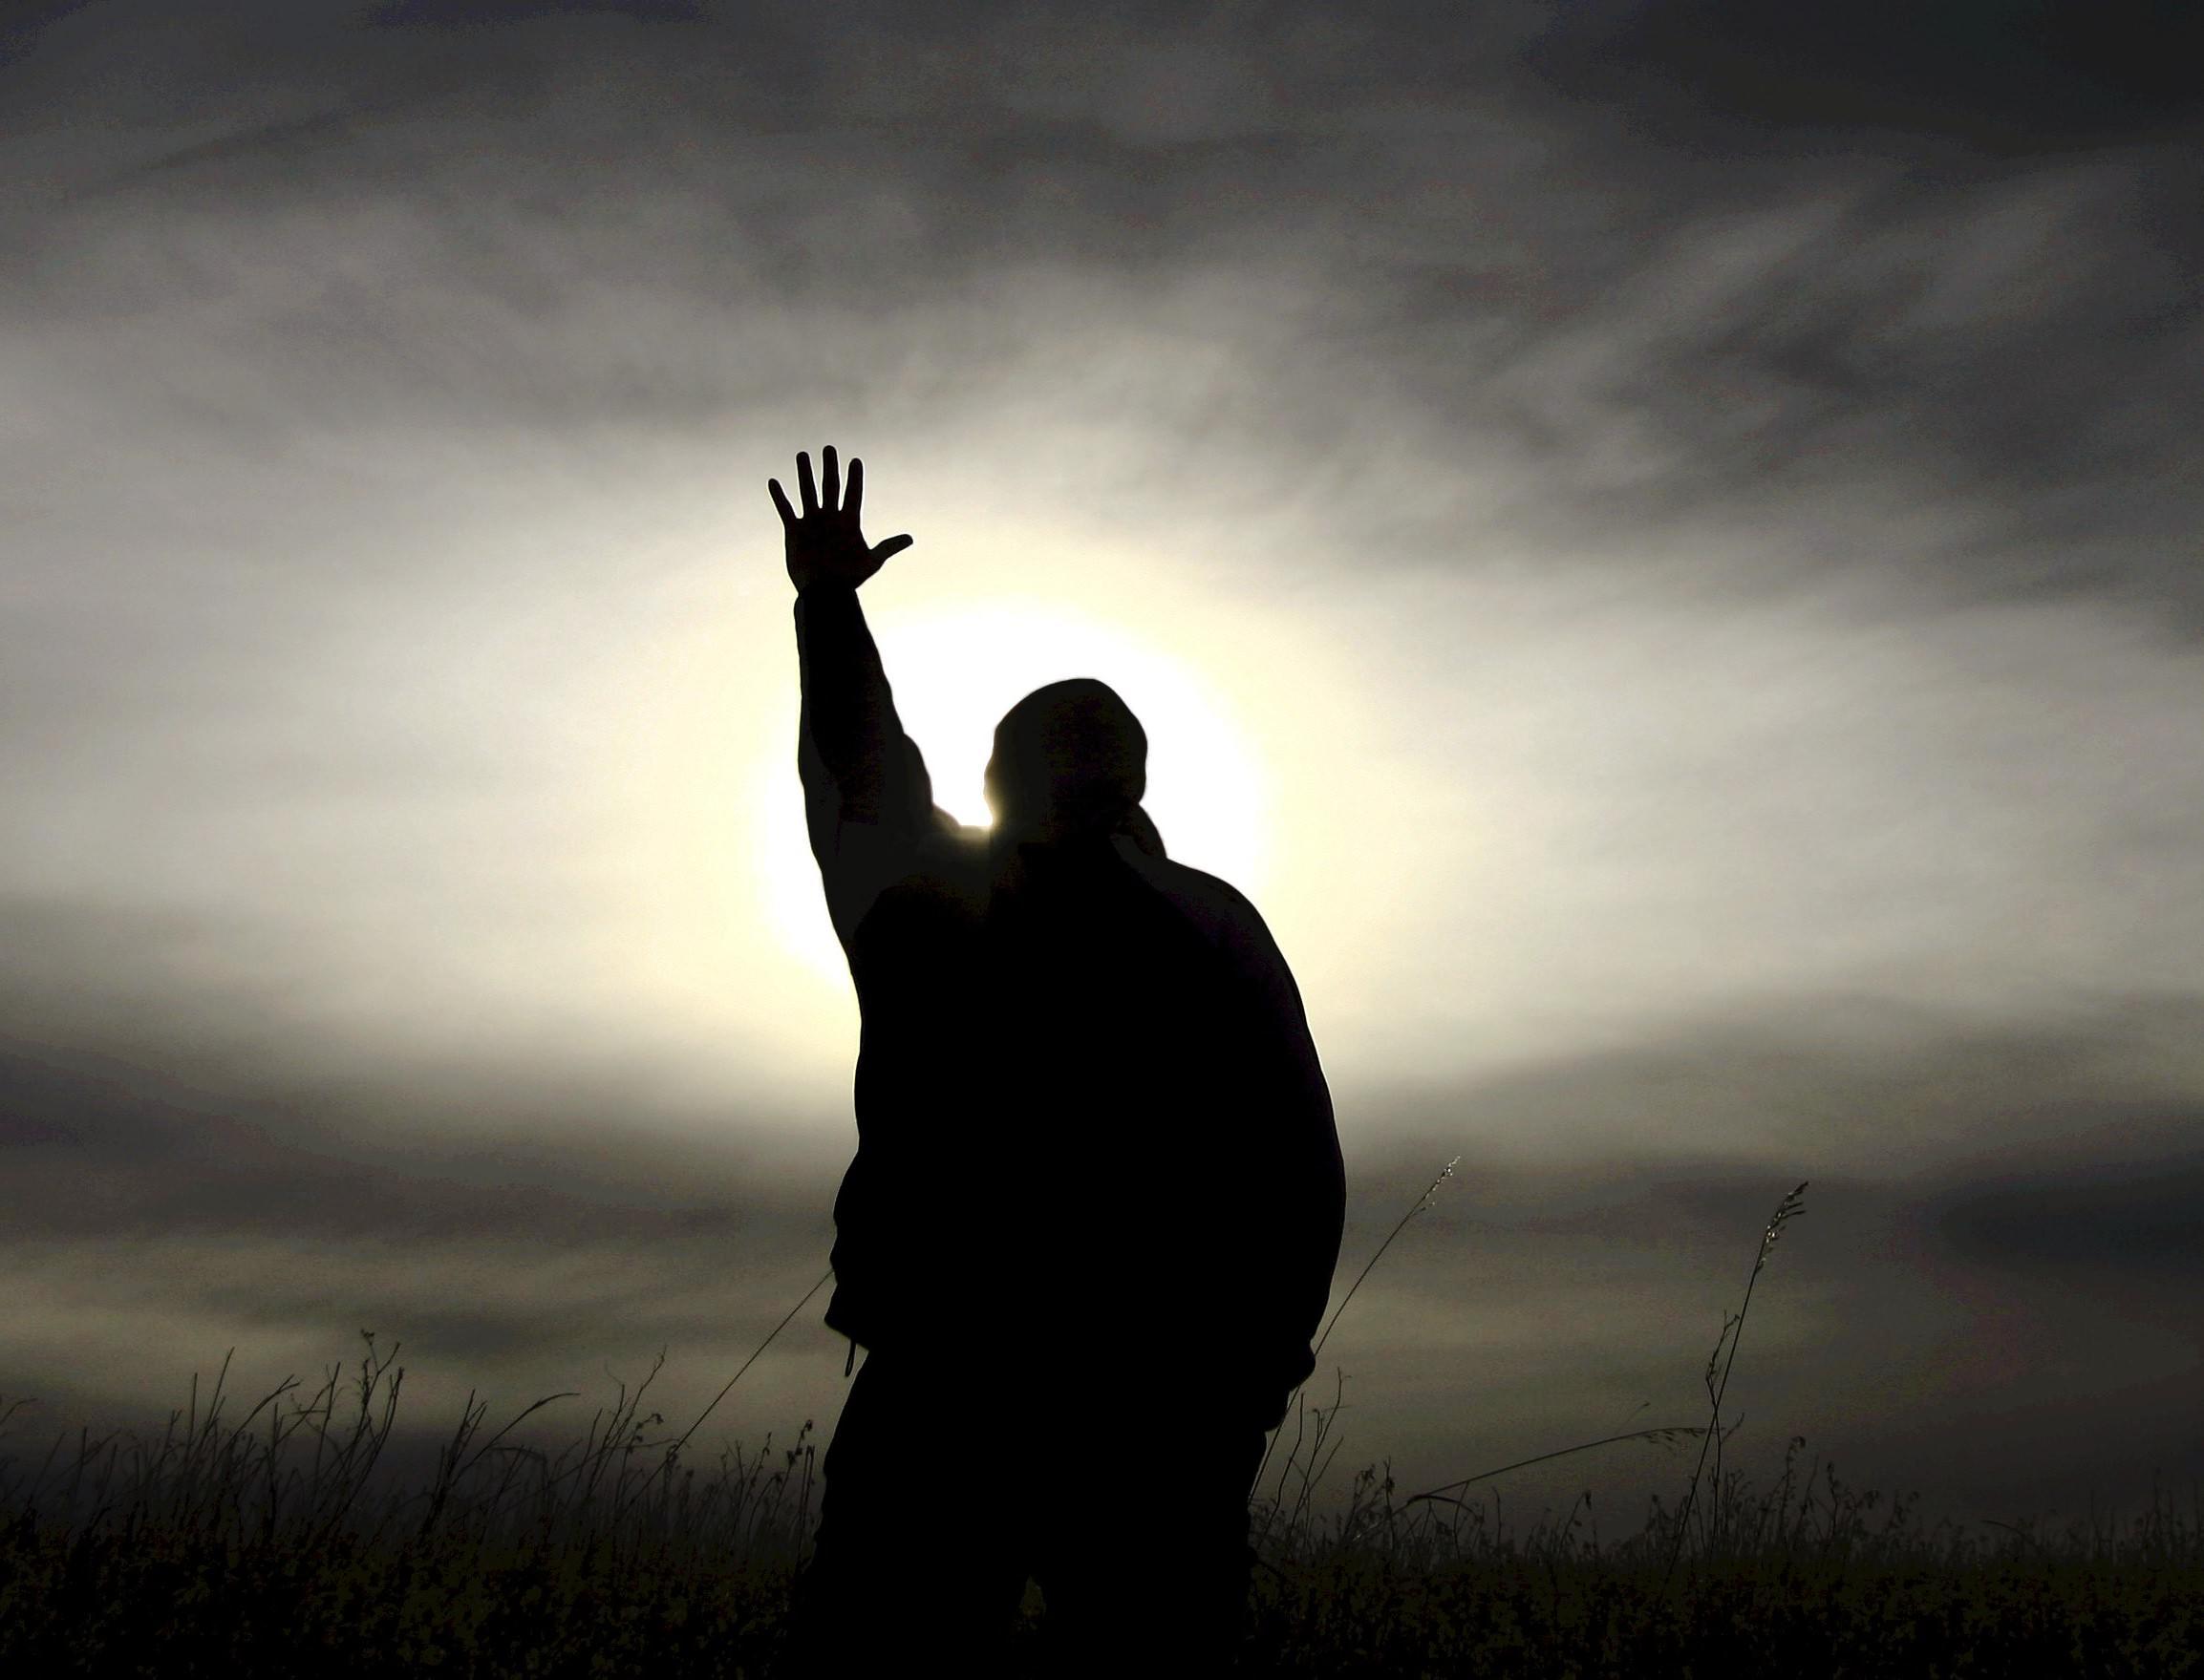 Next STEPS on your journey of faith – Step 4 – Practice Prayer; Celebrate the Sacraments